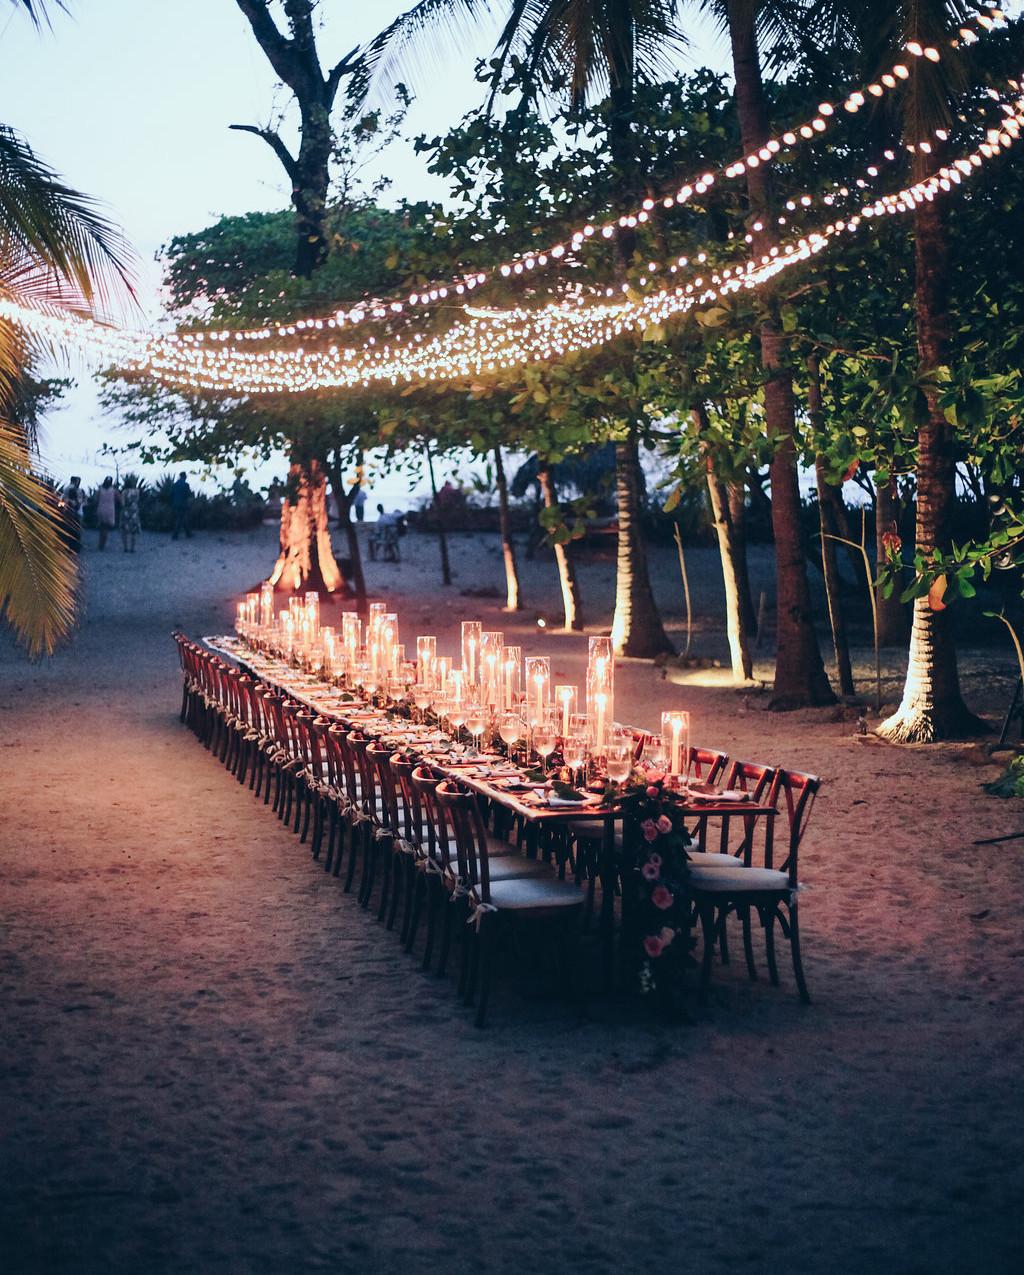 "alt=""wedding dinner table at night"""